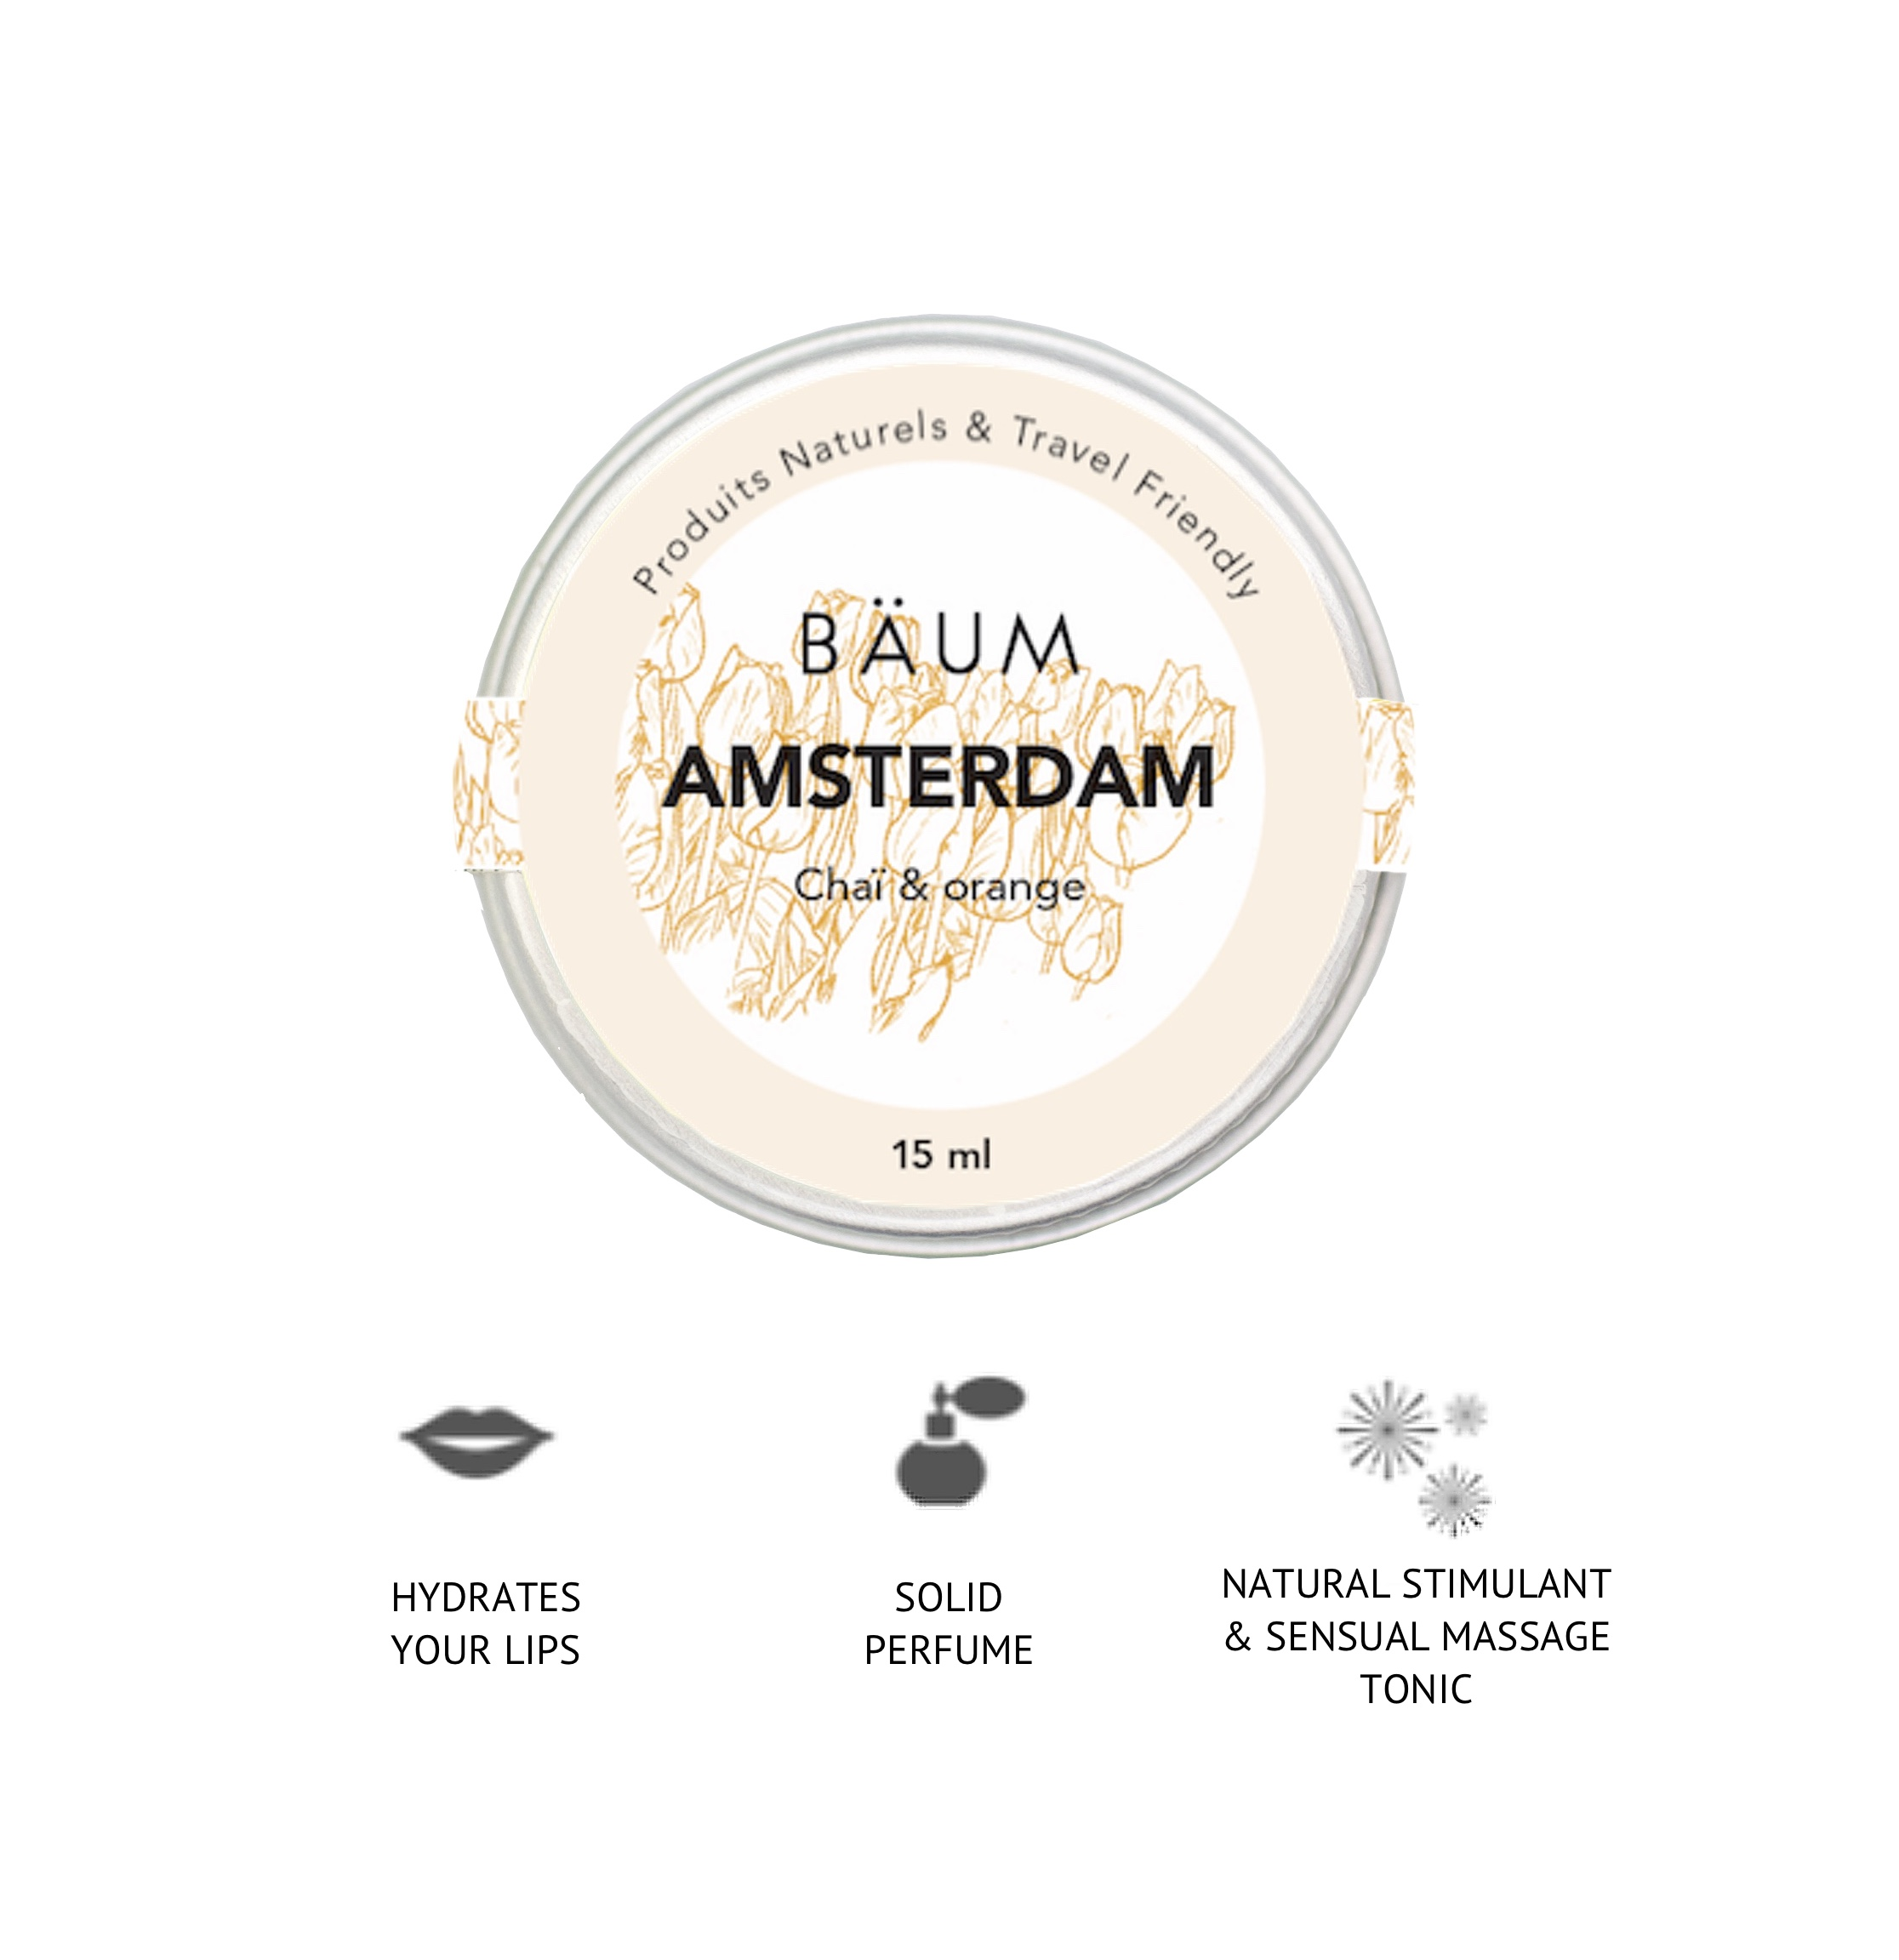 VF_product description eng_Amsterdam.jpg